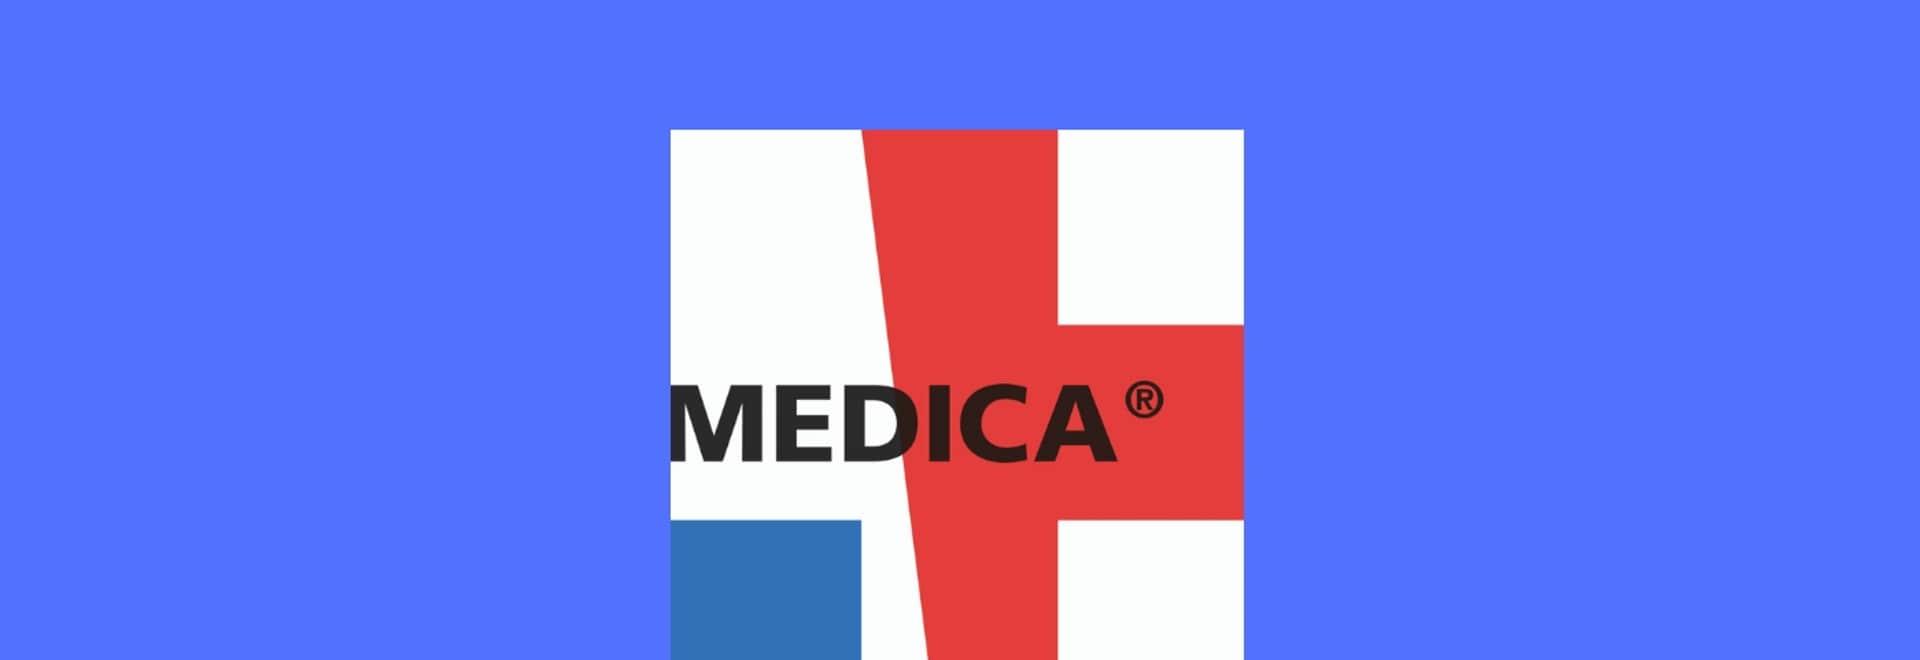 Gloreha en MEDICA 2018